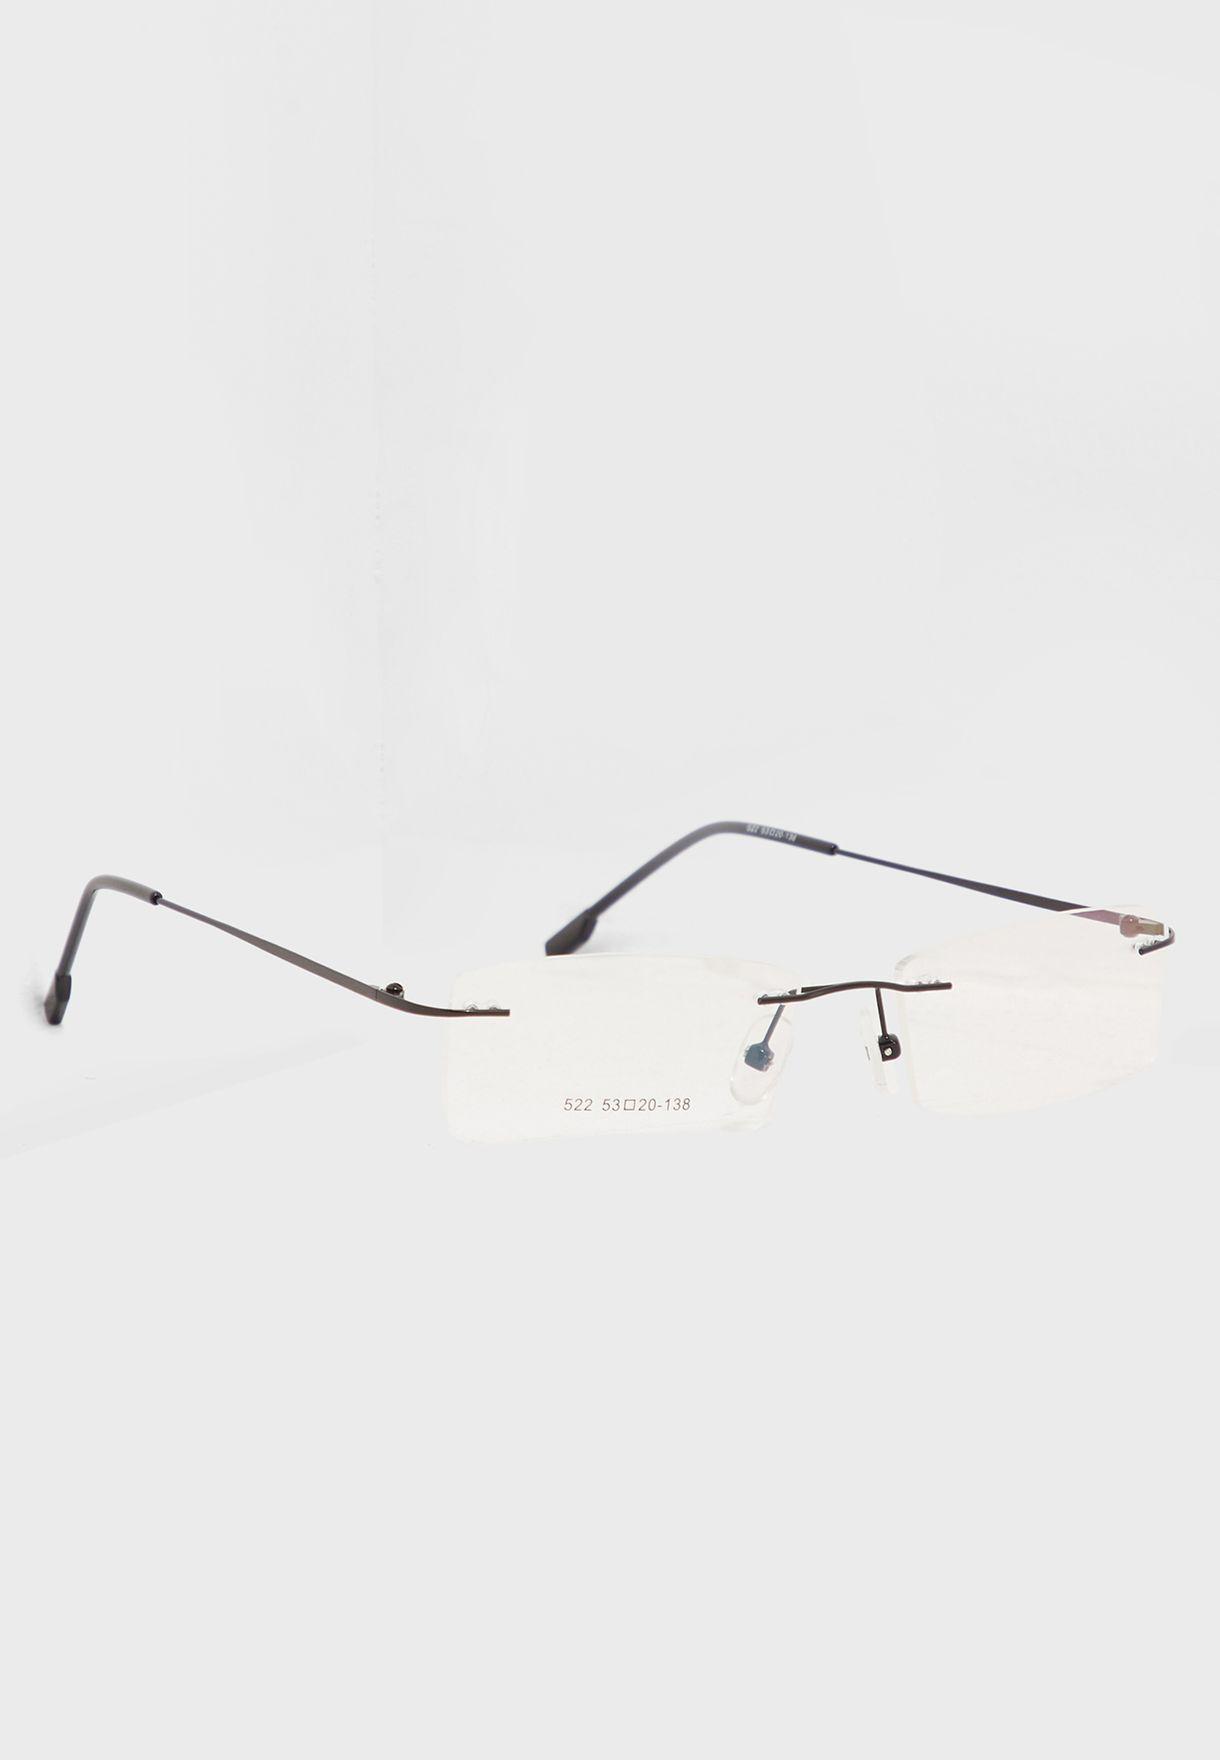 6d0e2a3a3f9 Shop Seventy five black Clear Rimless Glasses 522 for Men in UAE ...